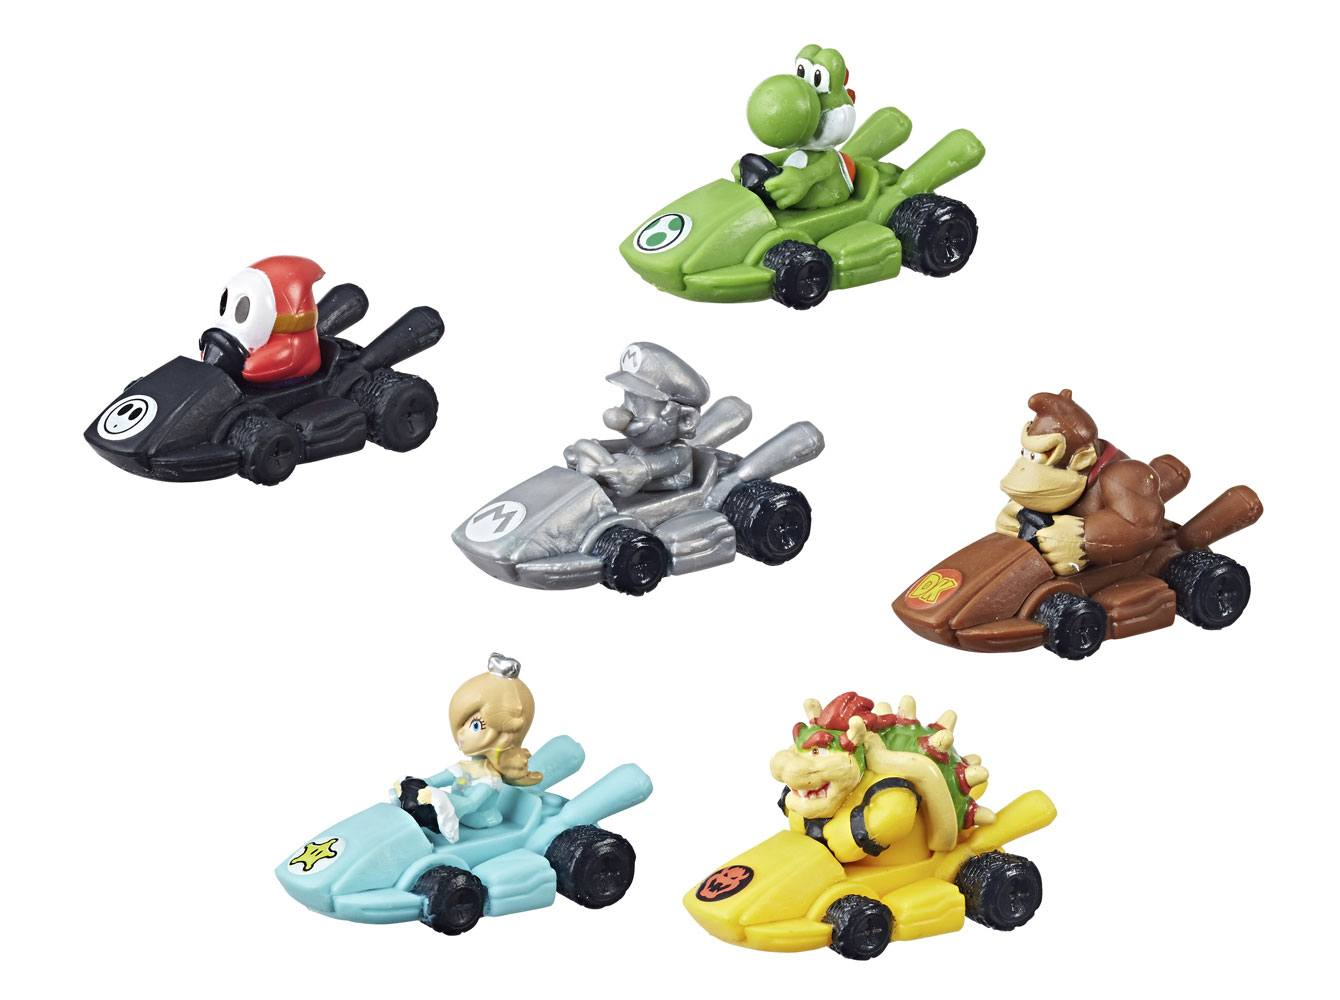 Nintendo Board Game Monopoly Gamer Mario Kart Edition Figure Pack Display (24) *German Version*